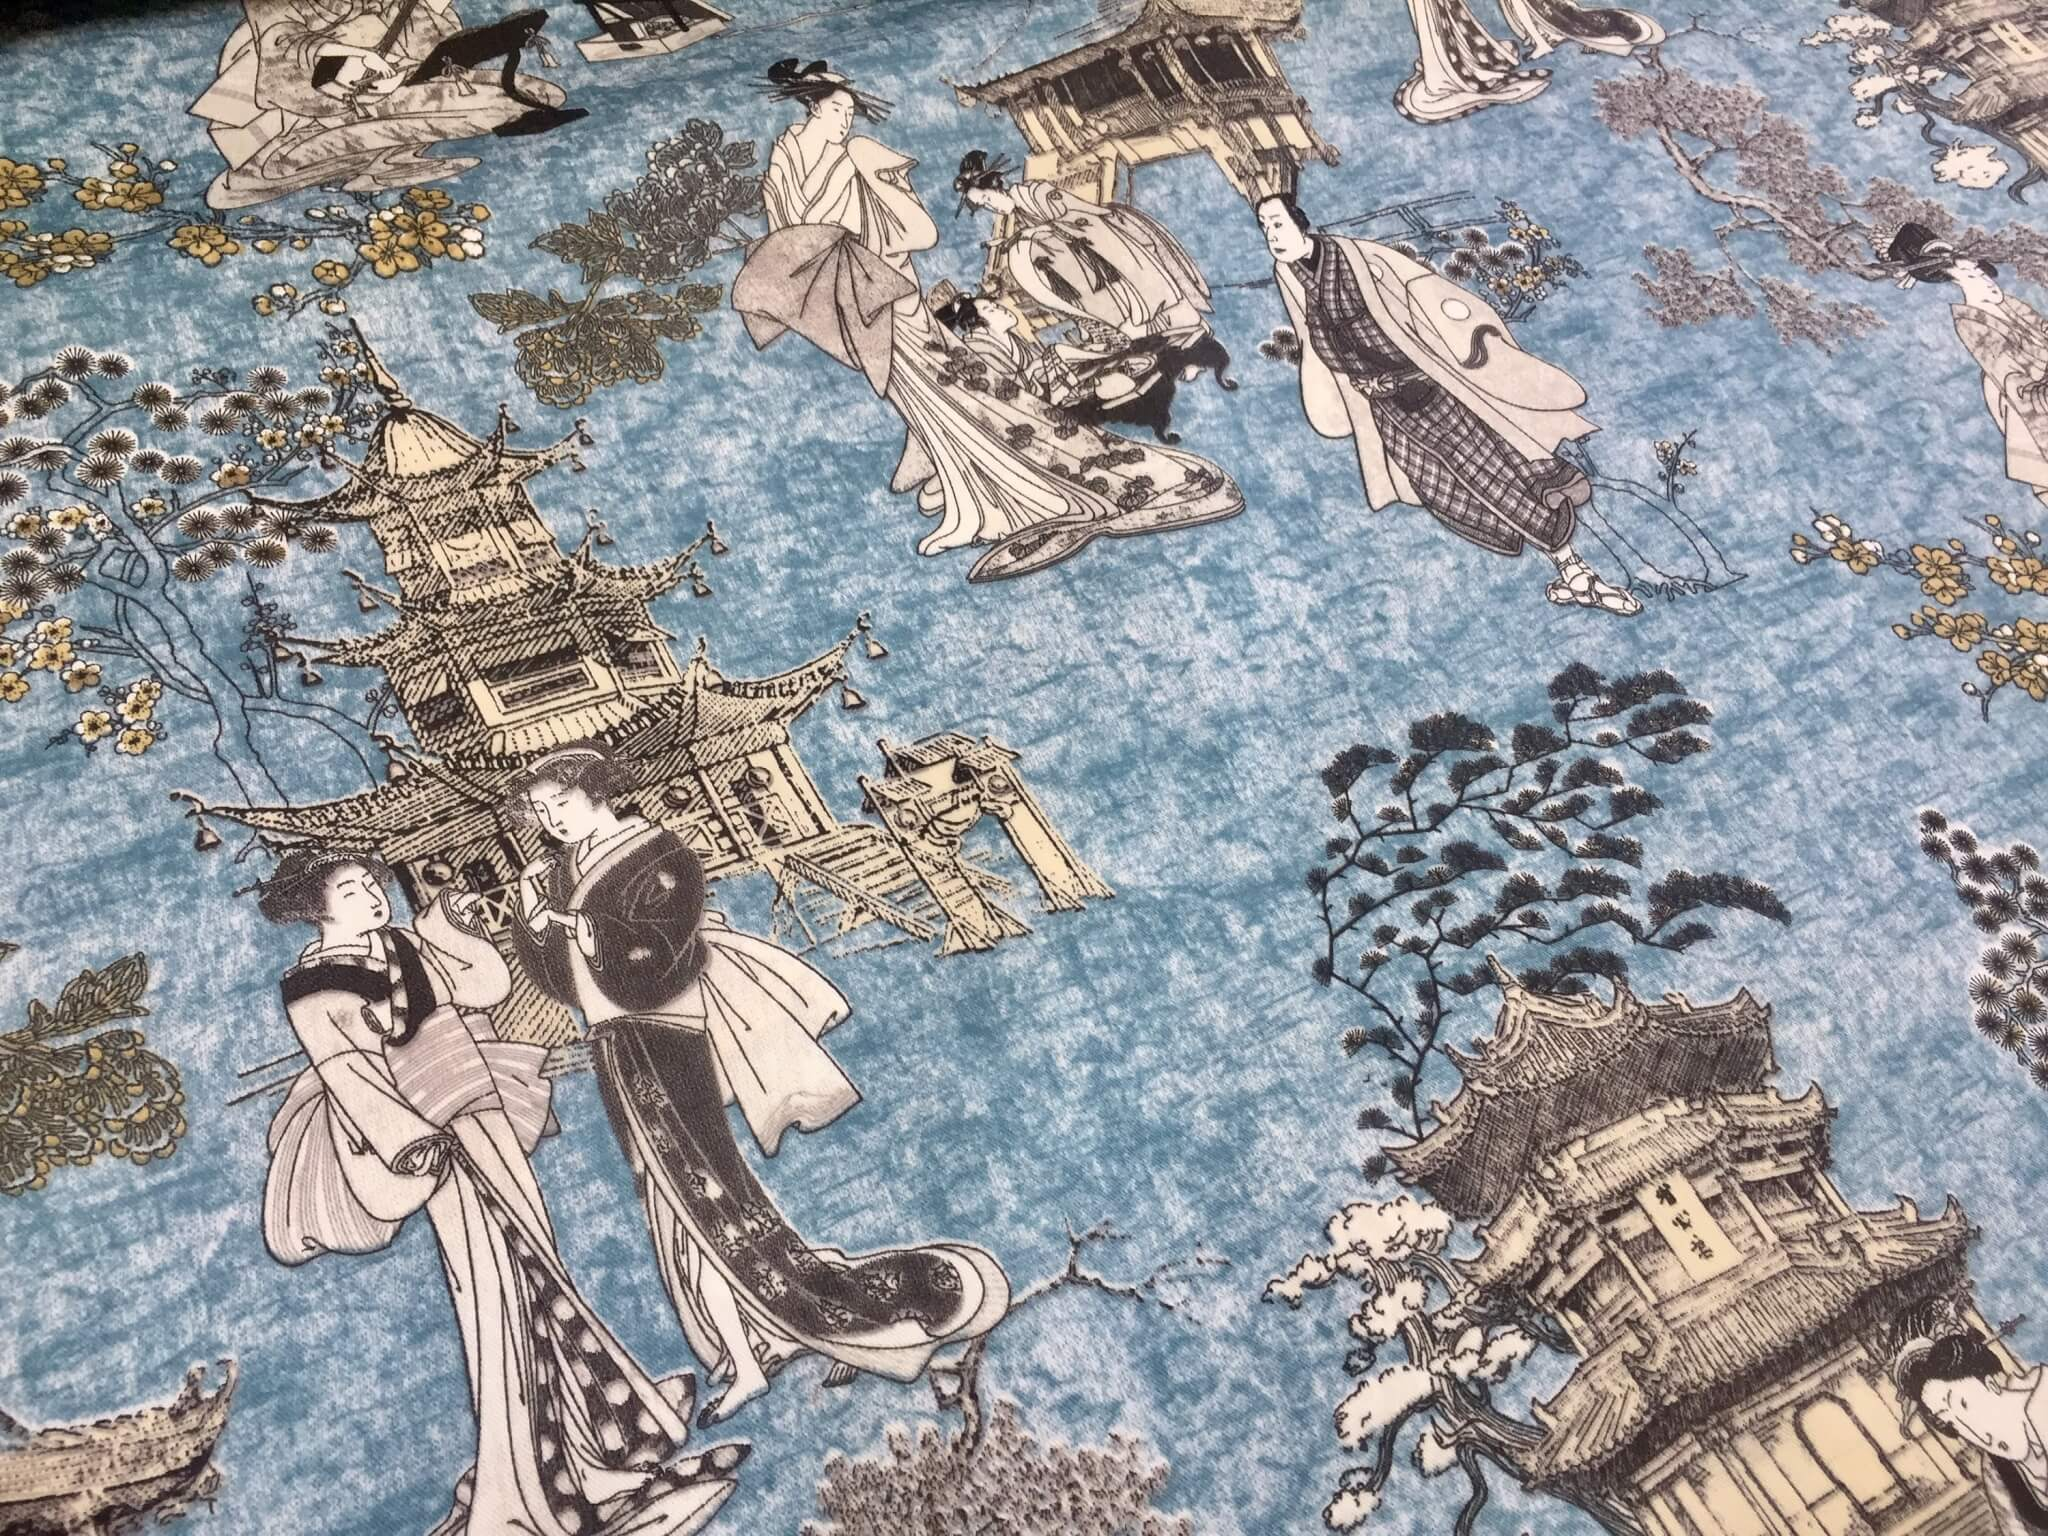 geisha-japanese-pagoda-oriental-twill-curtain-fabric-material-110-extra-wide-textile-blue-mustard-5b9592201.jpg